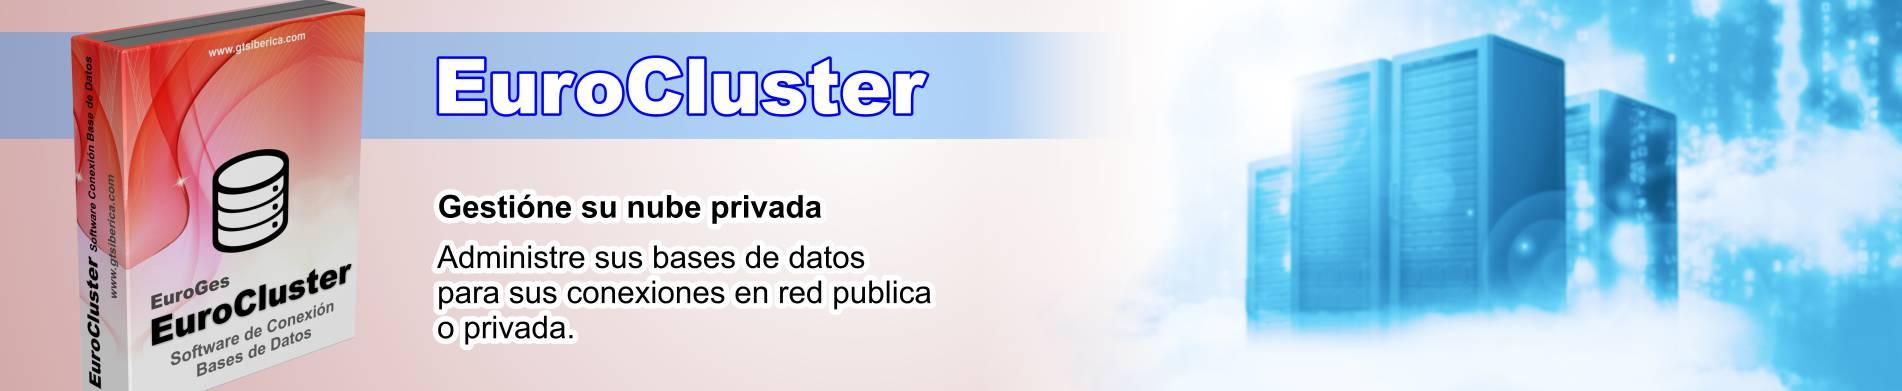 eurocluster slider